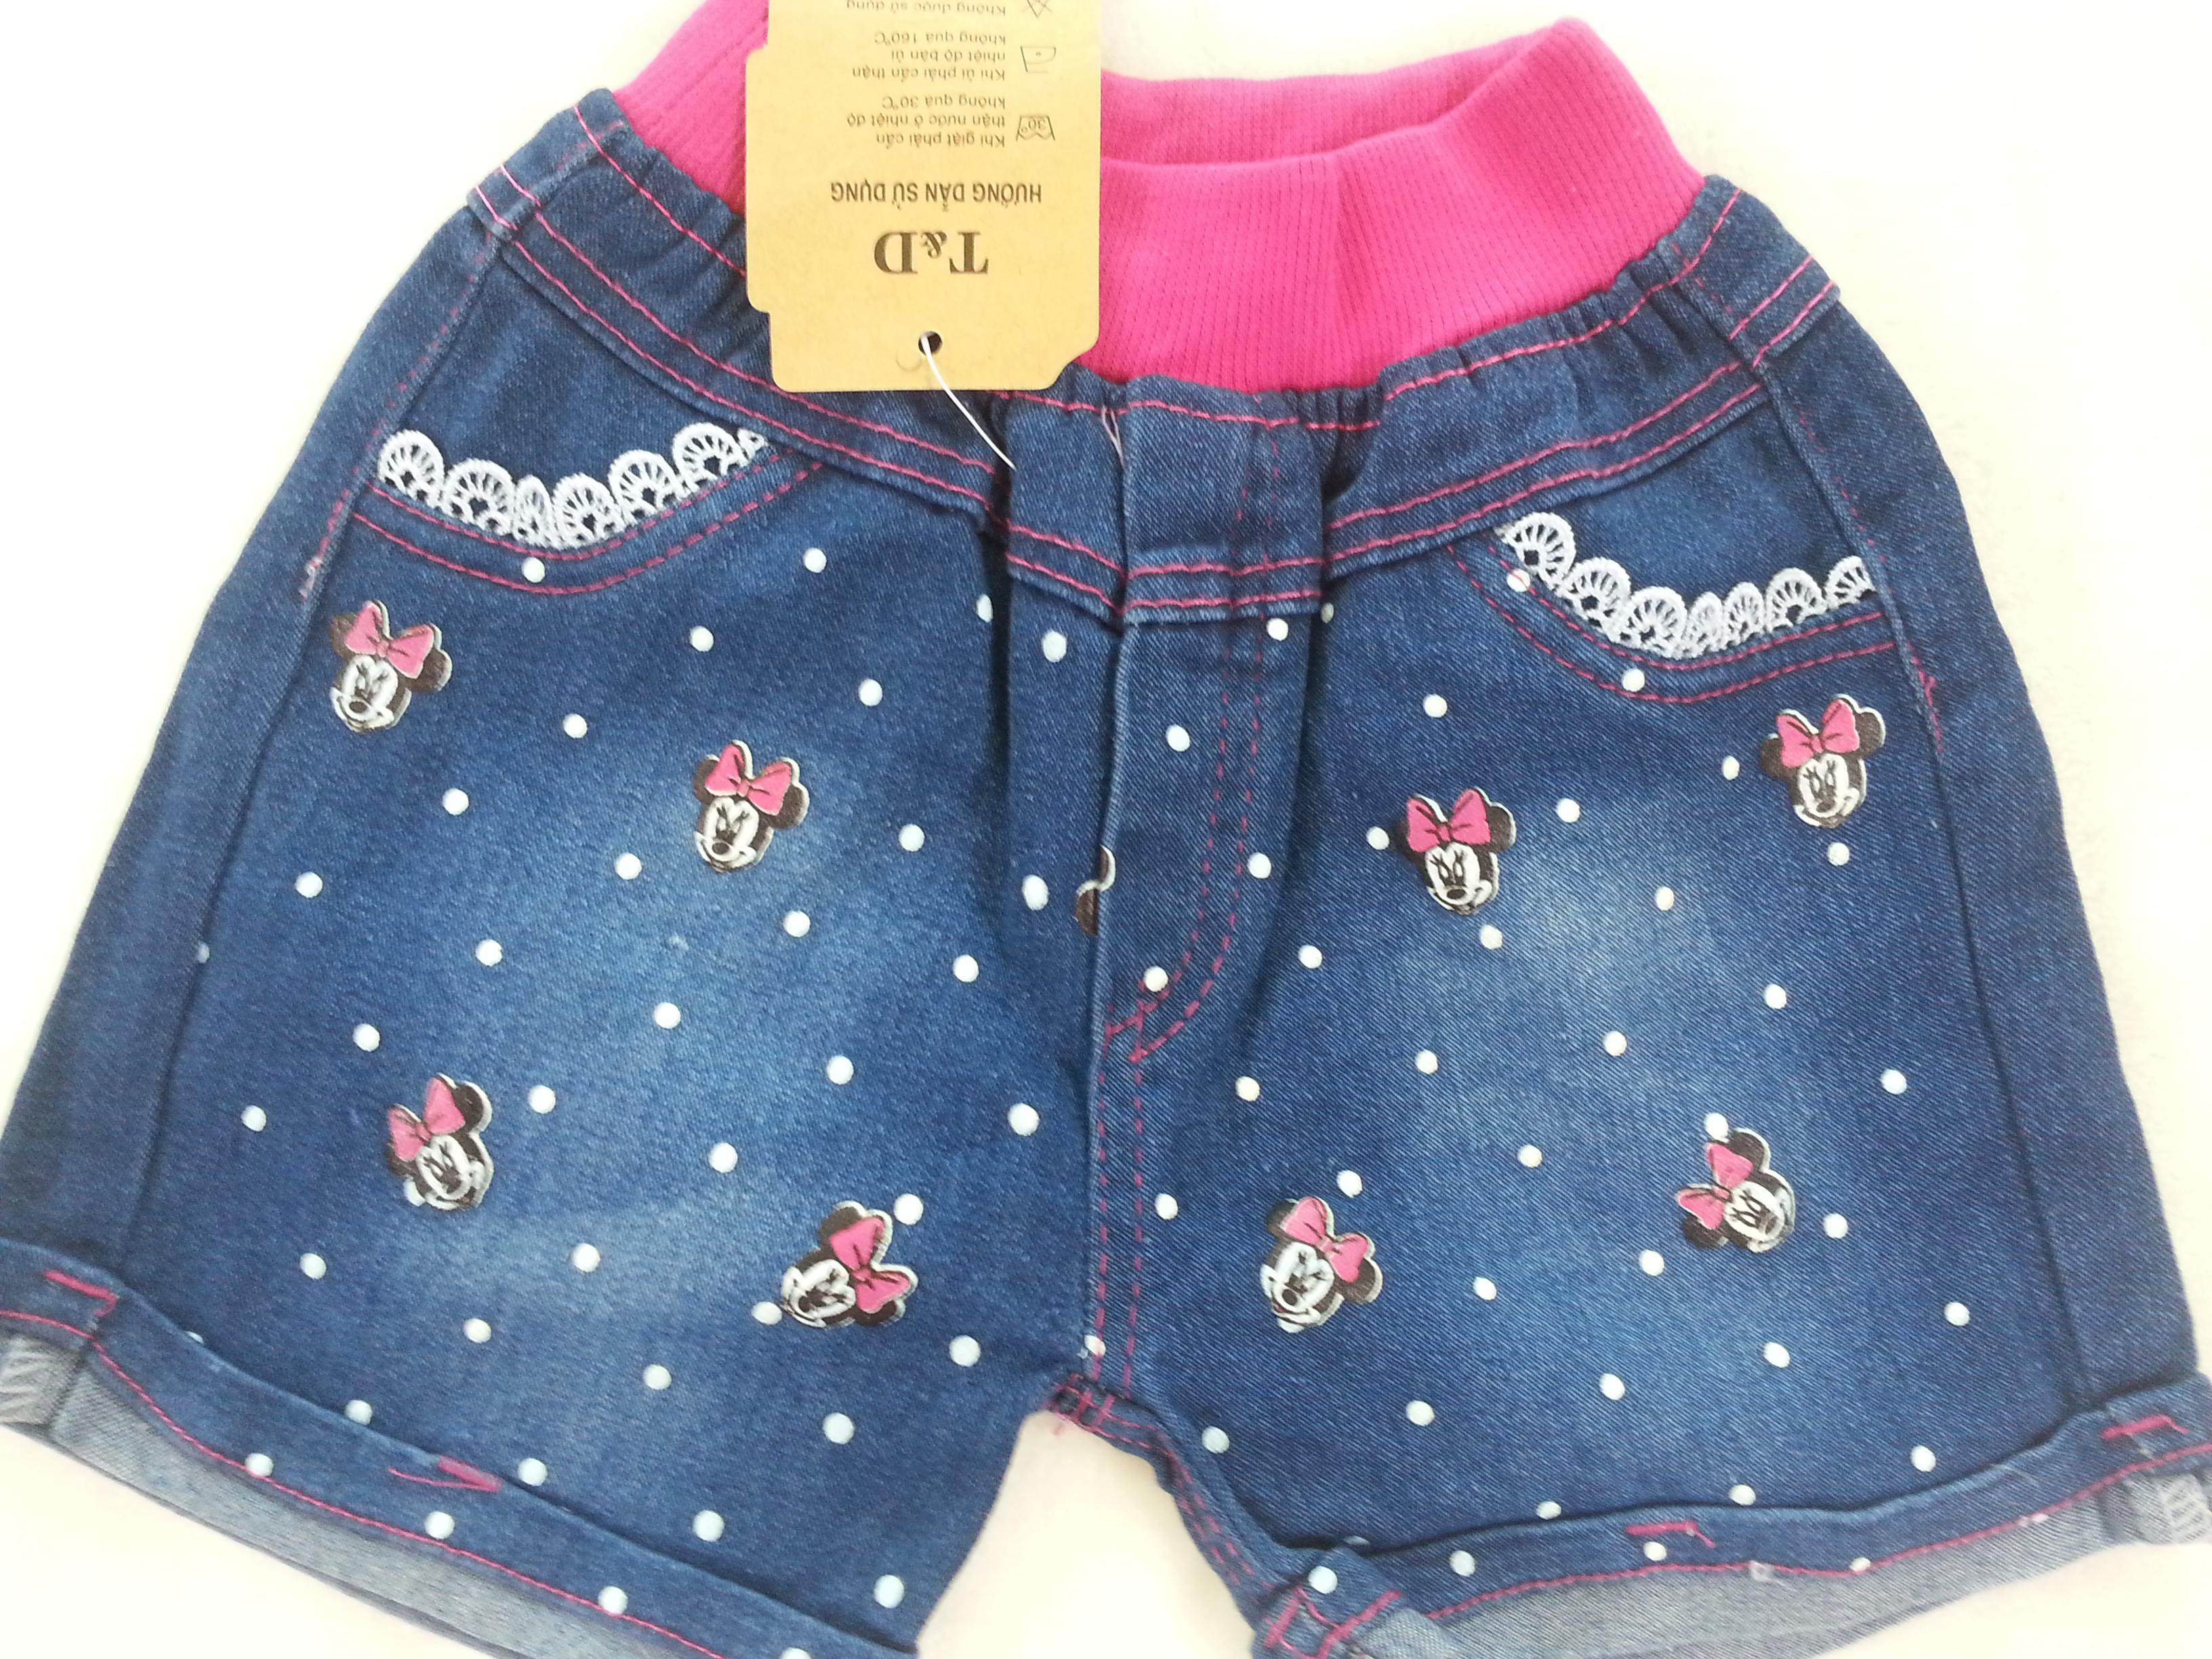 H&H : กางเกงยีนส์ขาสั้น ลายสกรีนมินนี่เมาส์ size : 1 (1-2y) / 6 (4-5y)